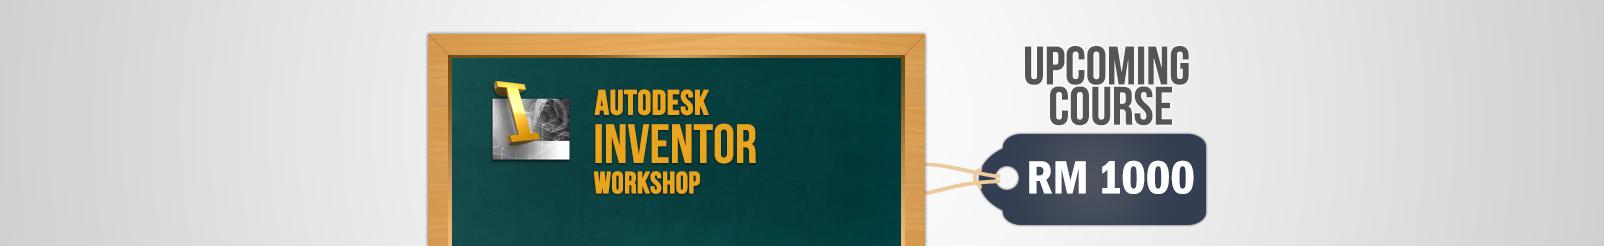 Autodesk Inventor 2013 Workshop